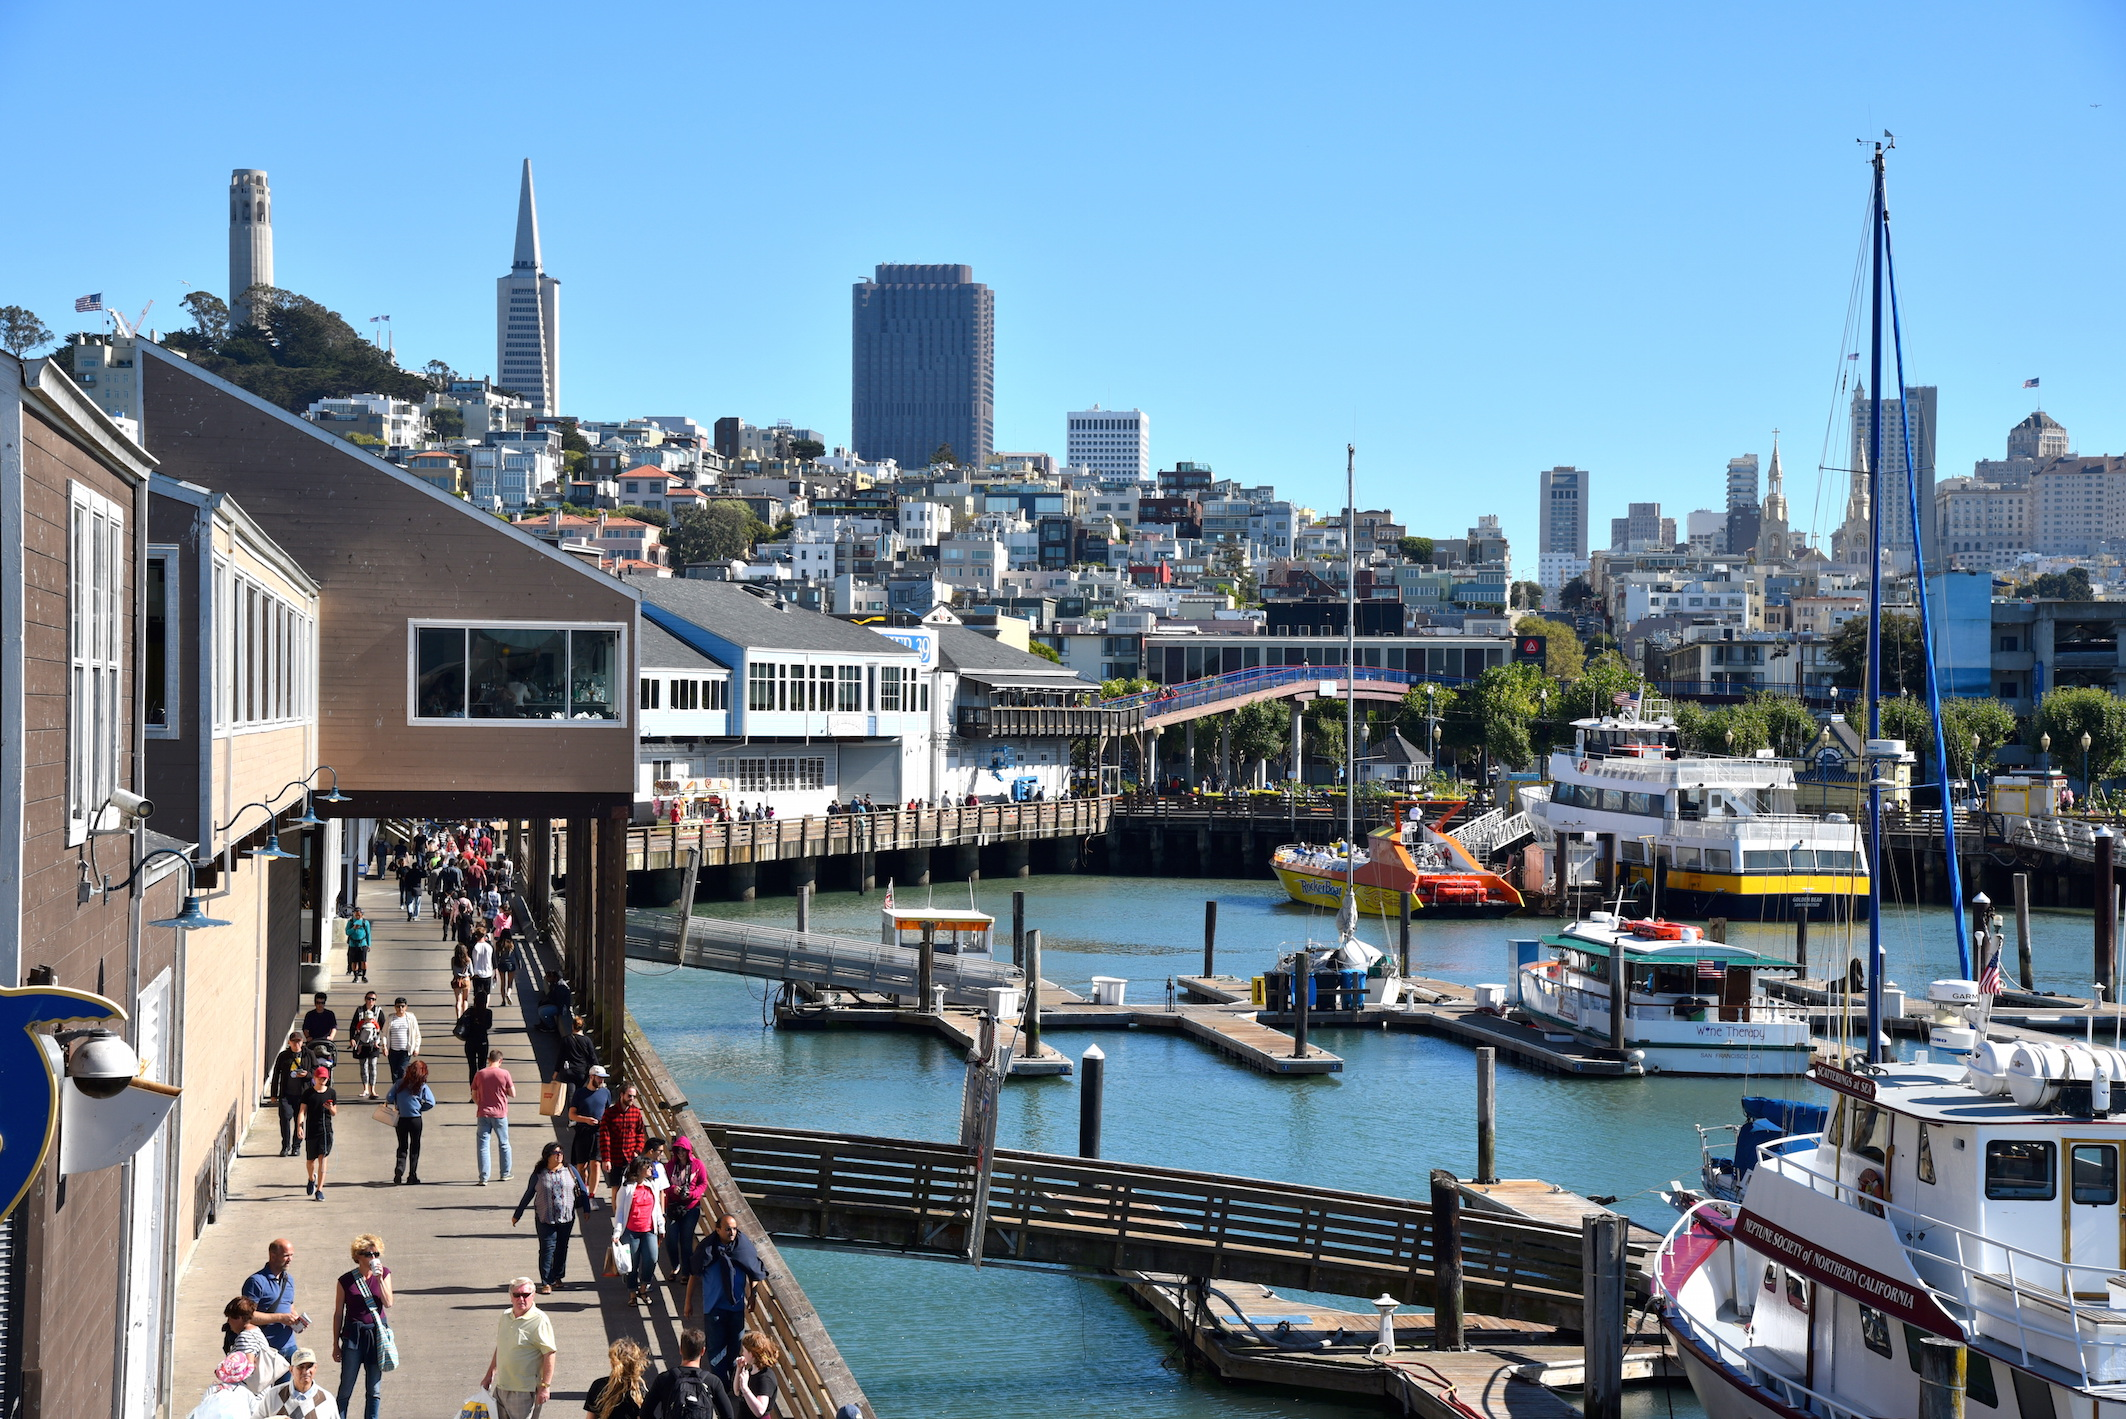 Fisherman's Wharf Pier 39 San Francisco CA